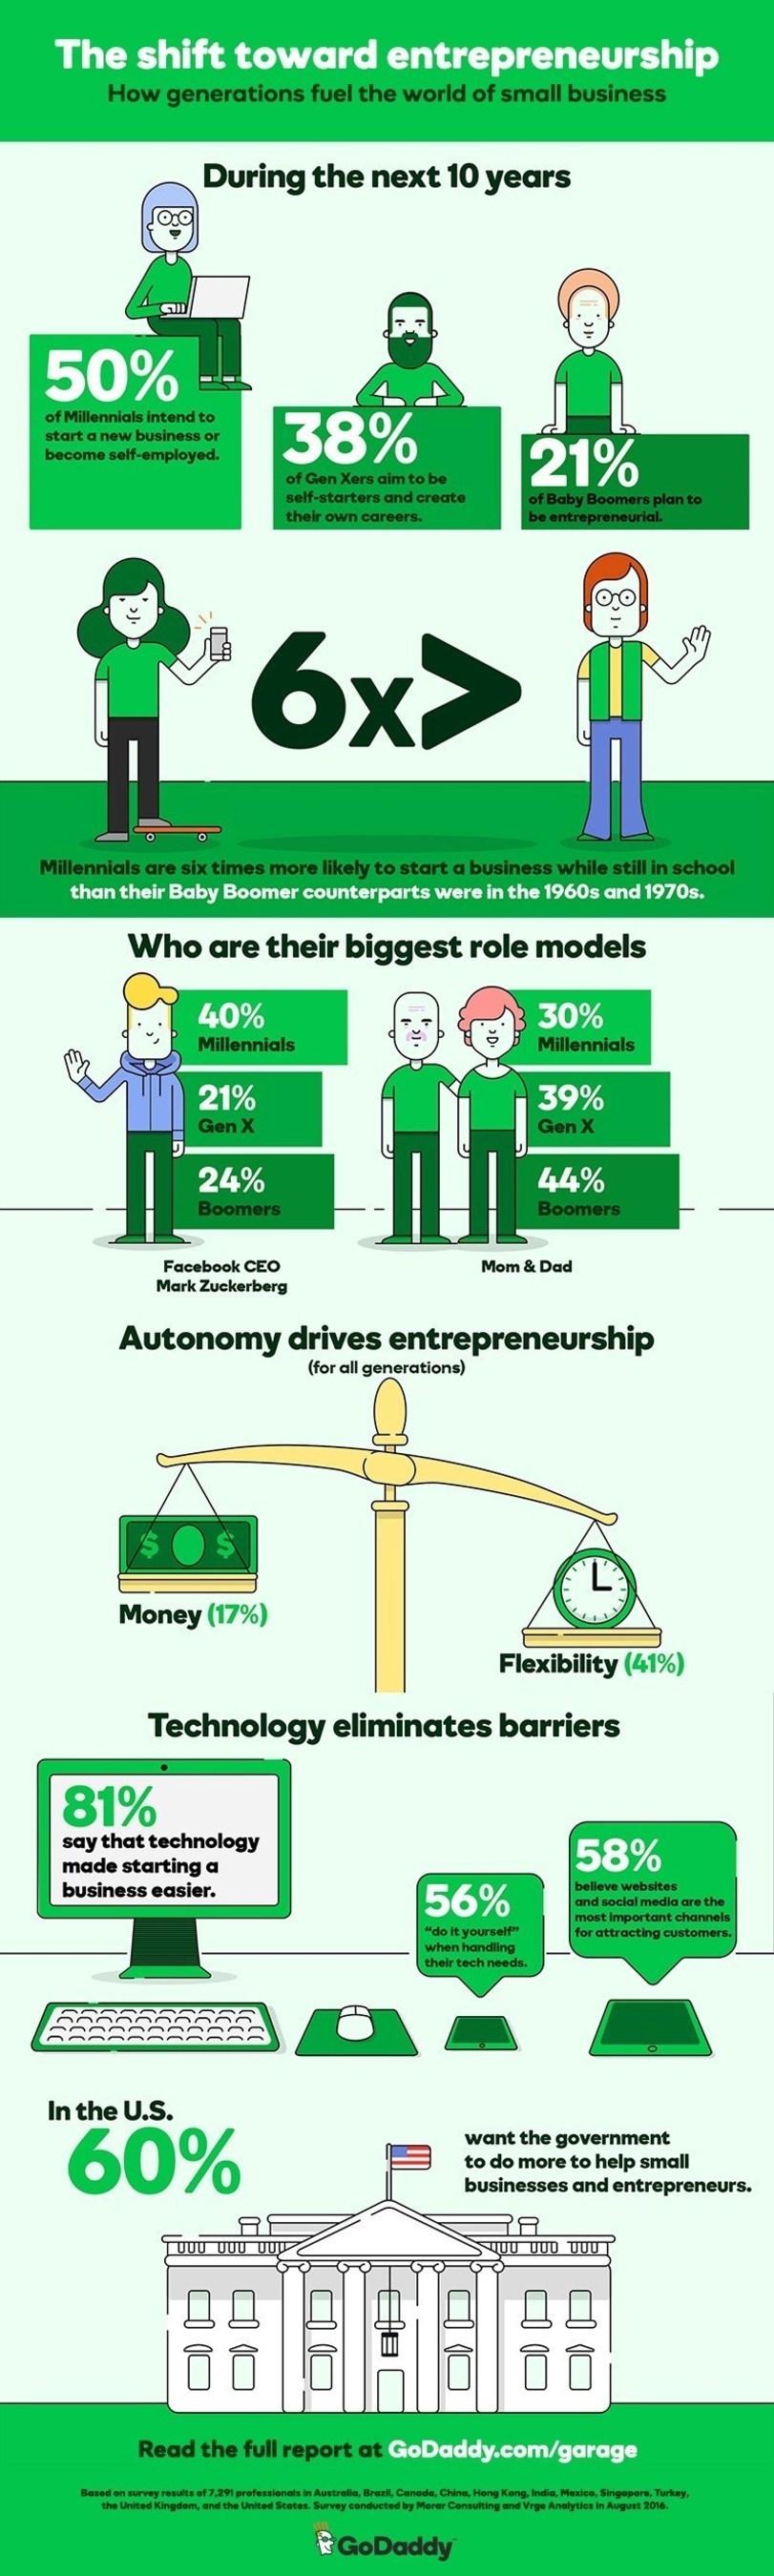 GoDaddy Global Survey Infographic